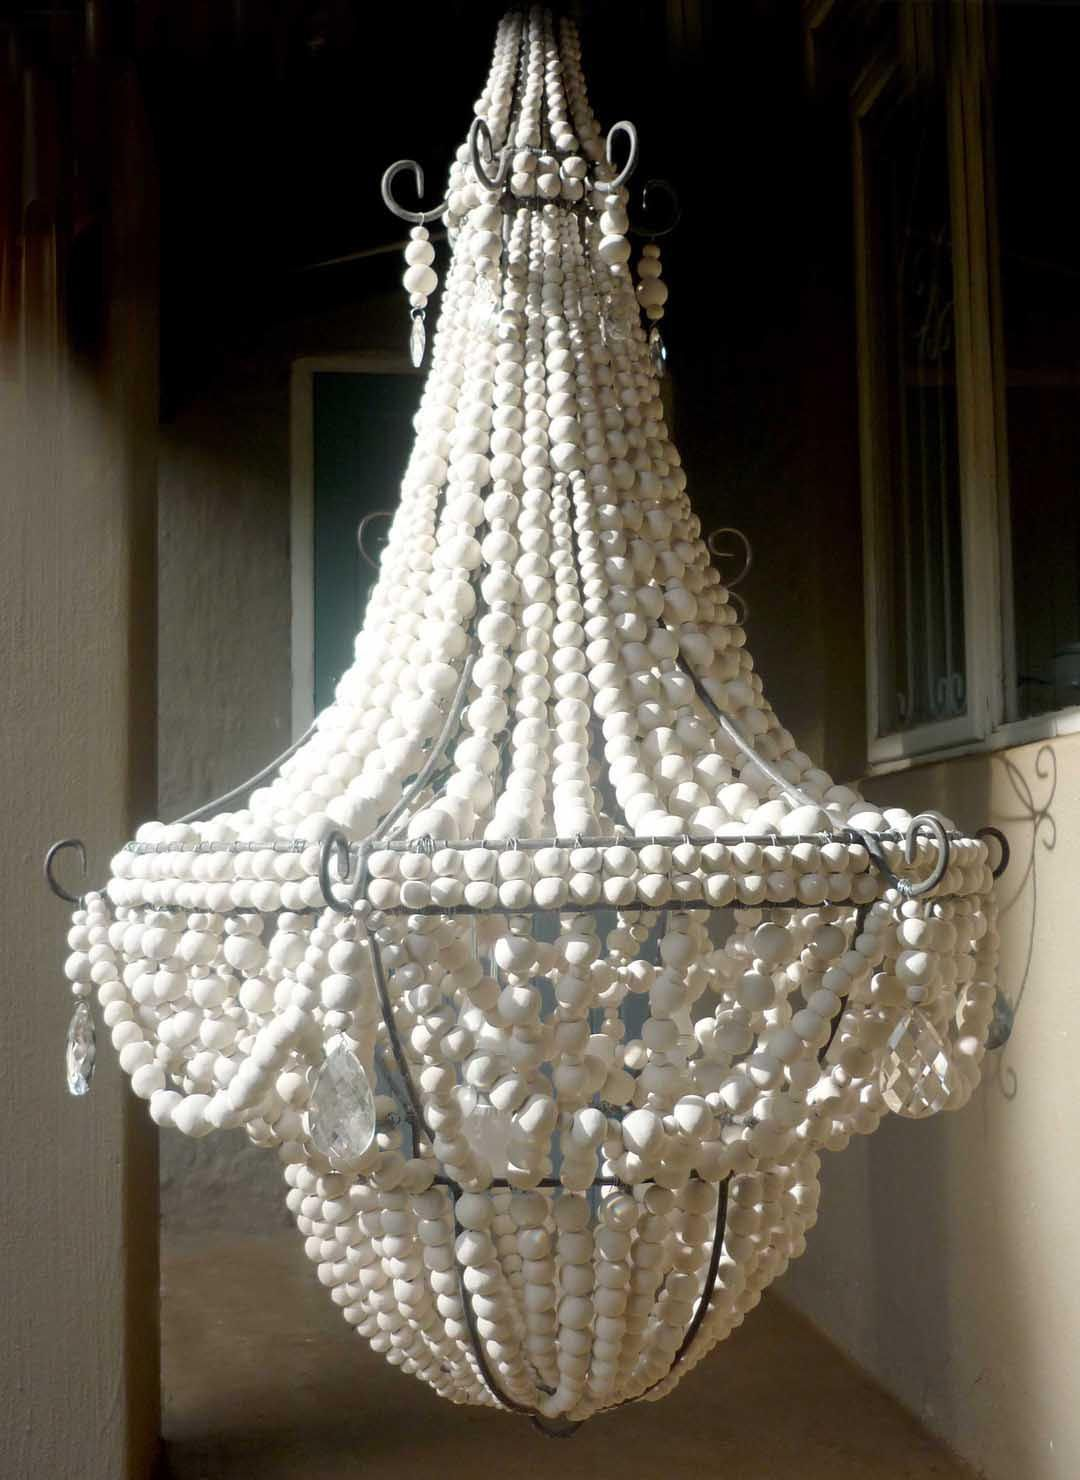 Elena wood bead chandelier chandeliers pinterest candelabros elena wood bead chandelier aloadofball Image collections